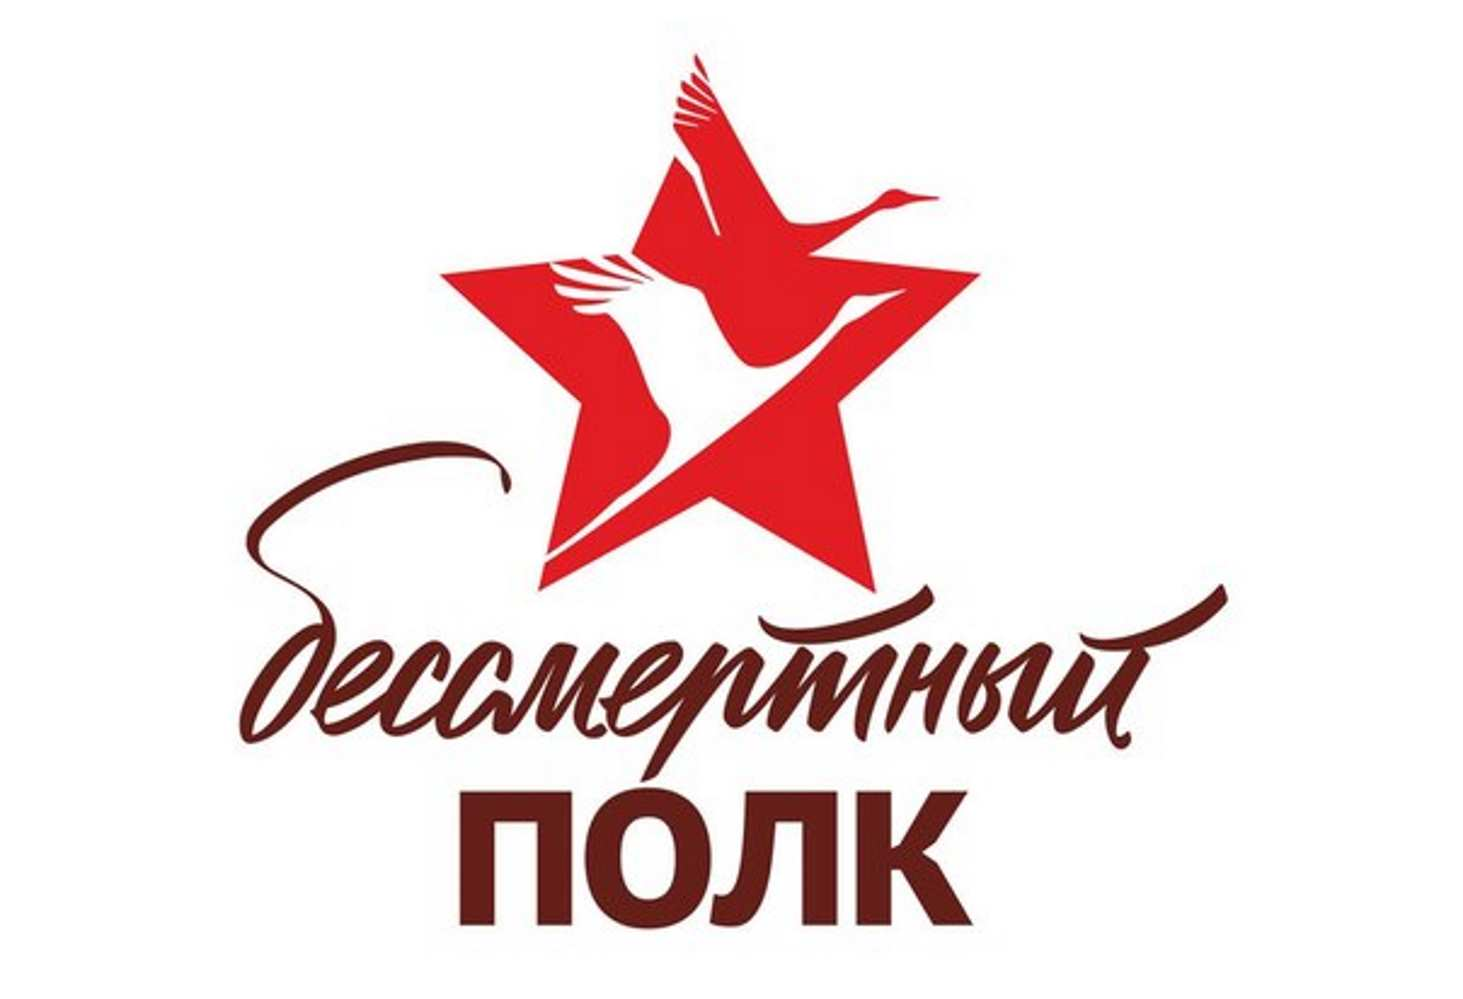 grishin-aleksandr-ivanovich